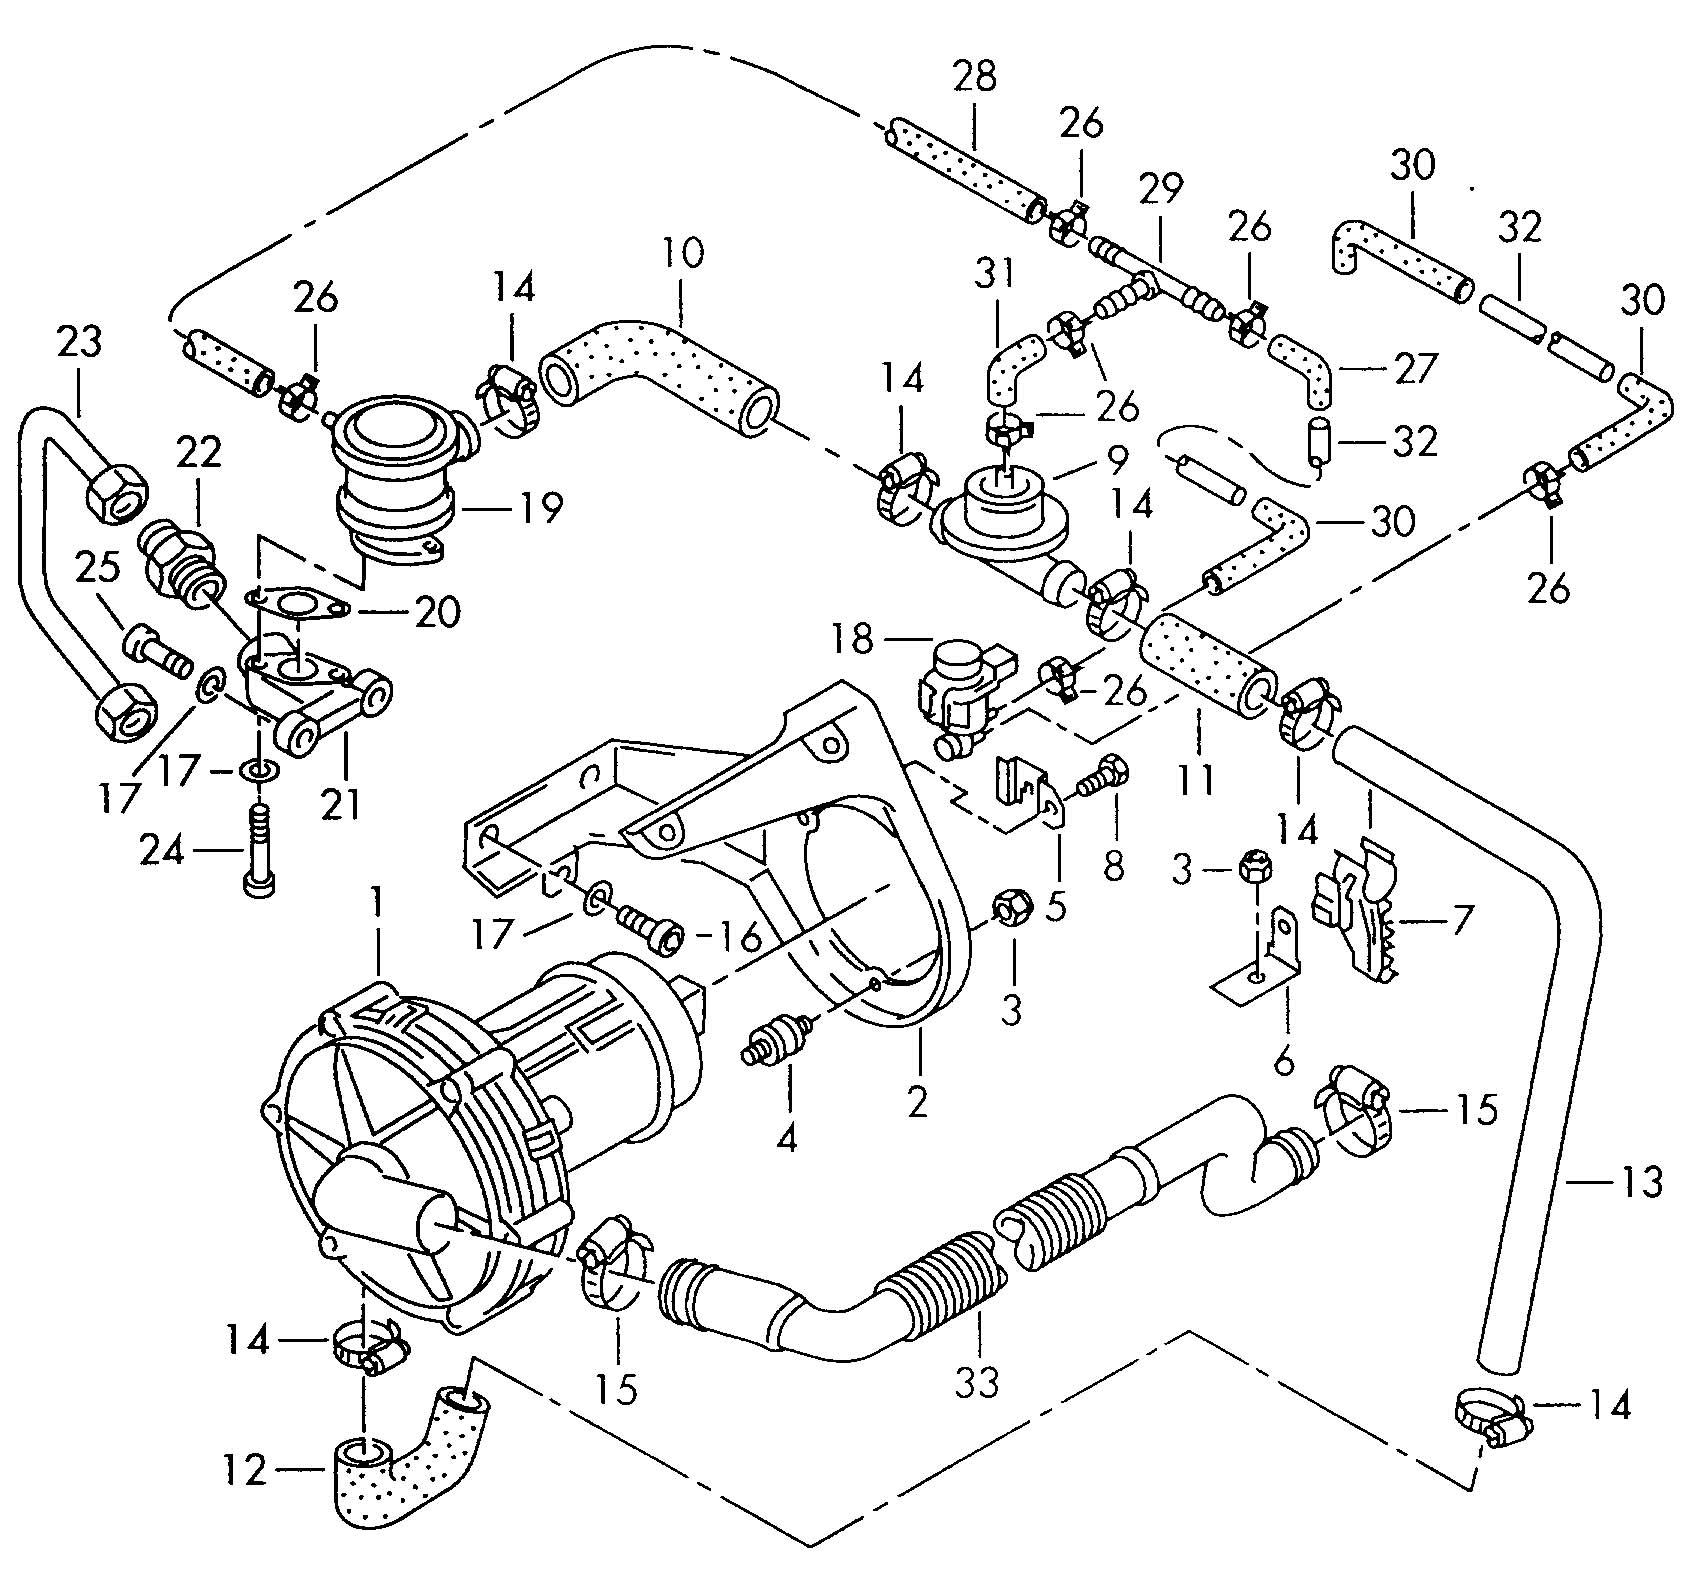 hight resolution of volkswagen 2002 cabrio 2 0 engine diagram